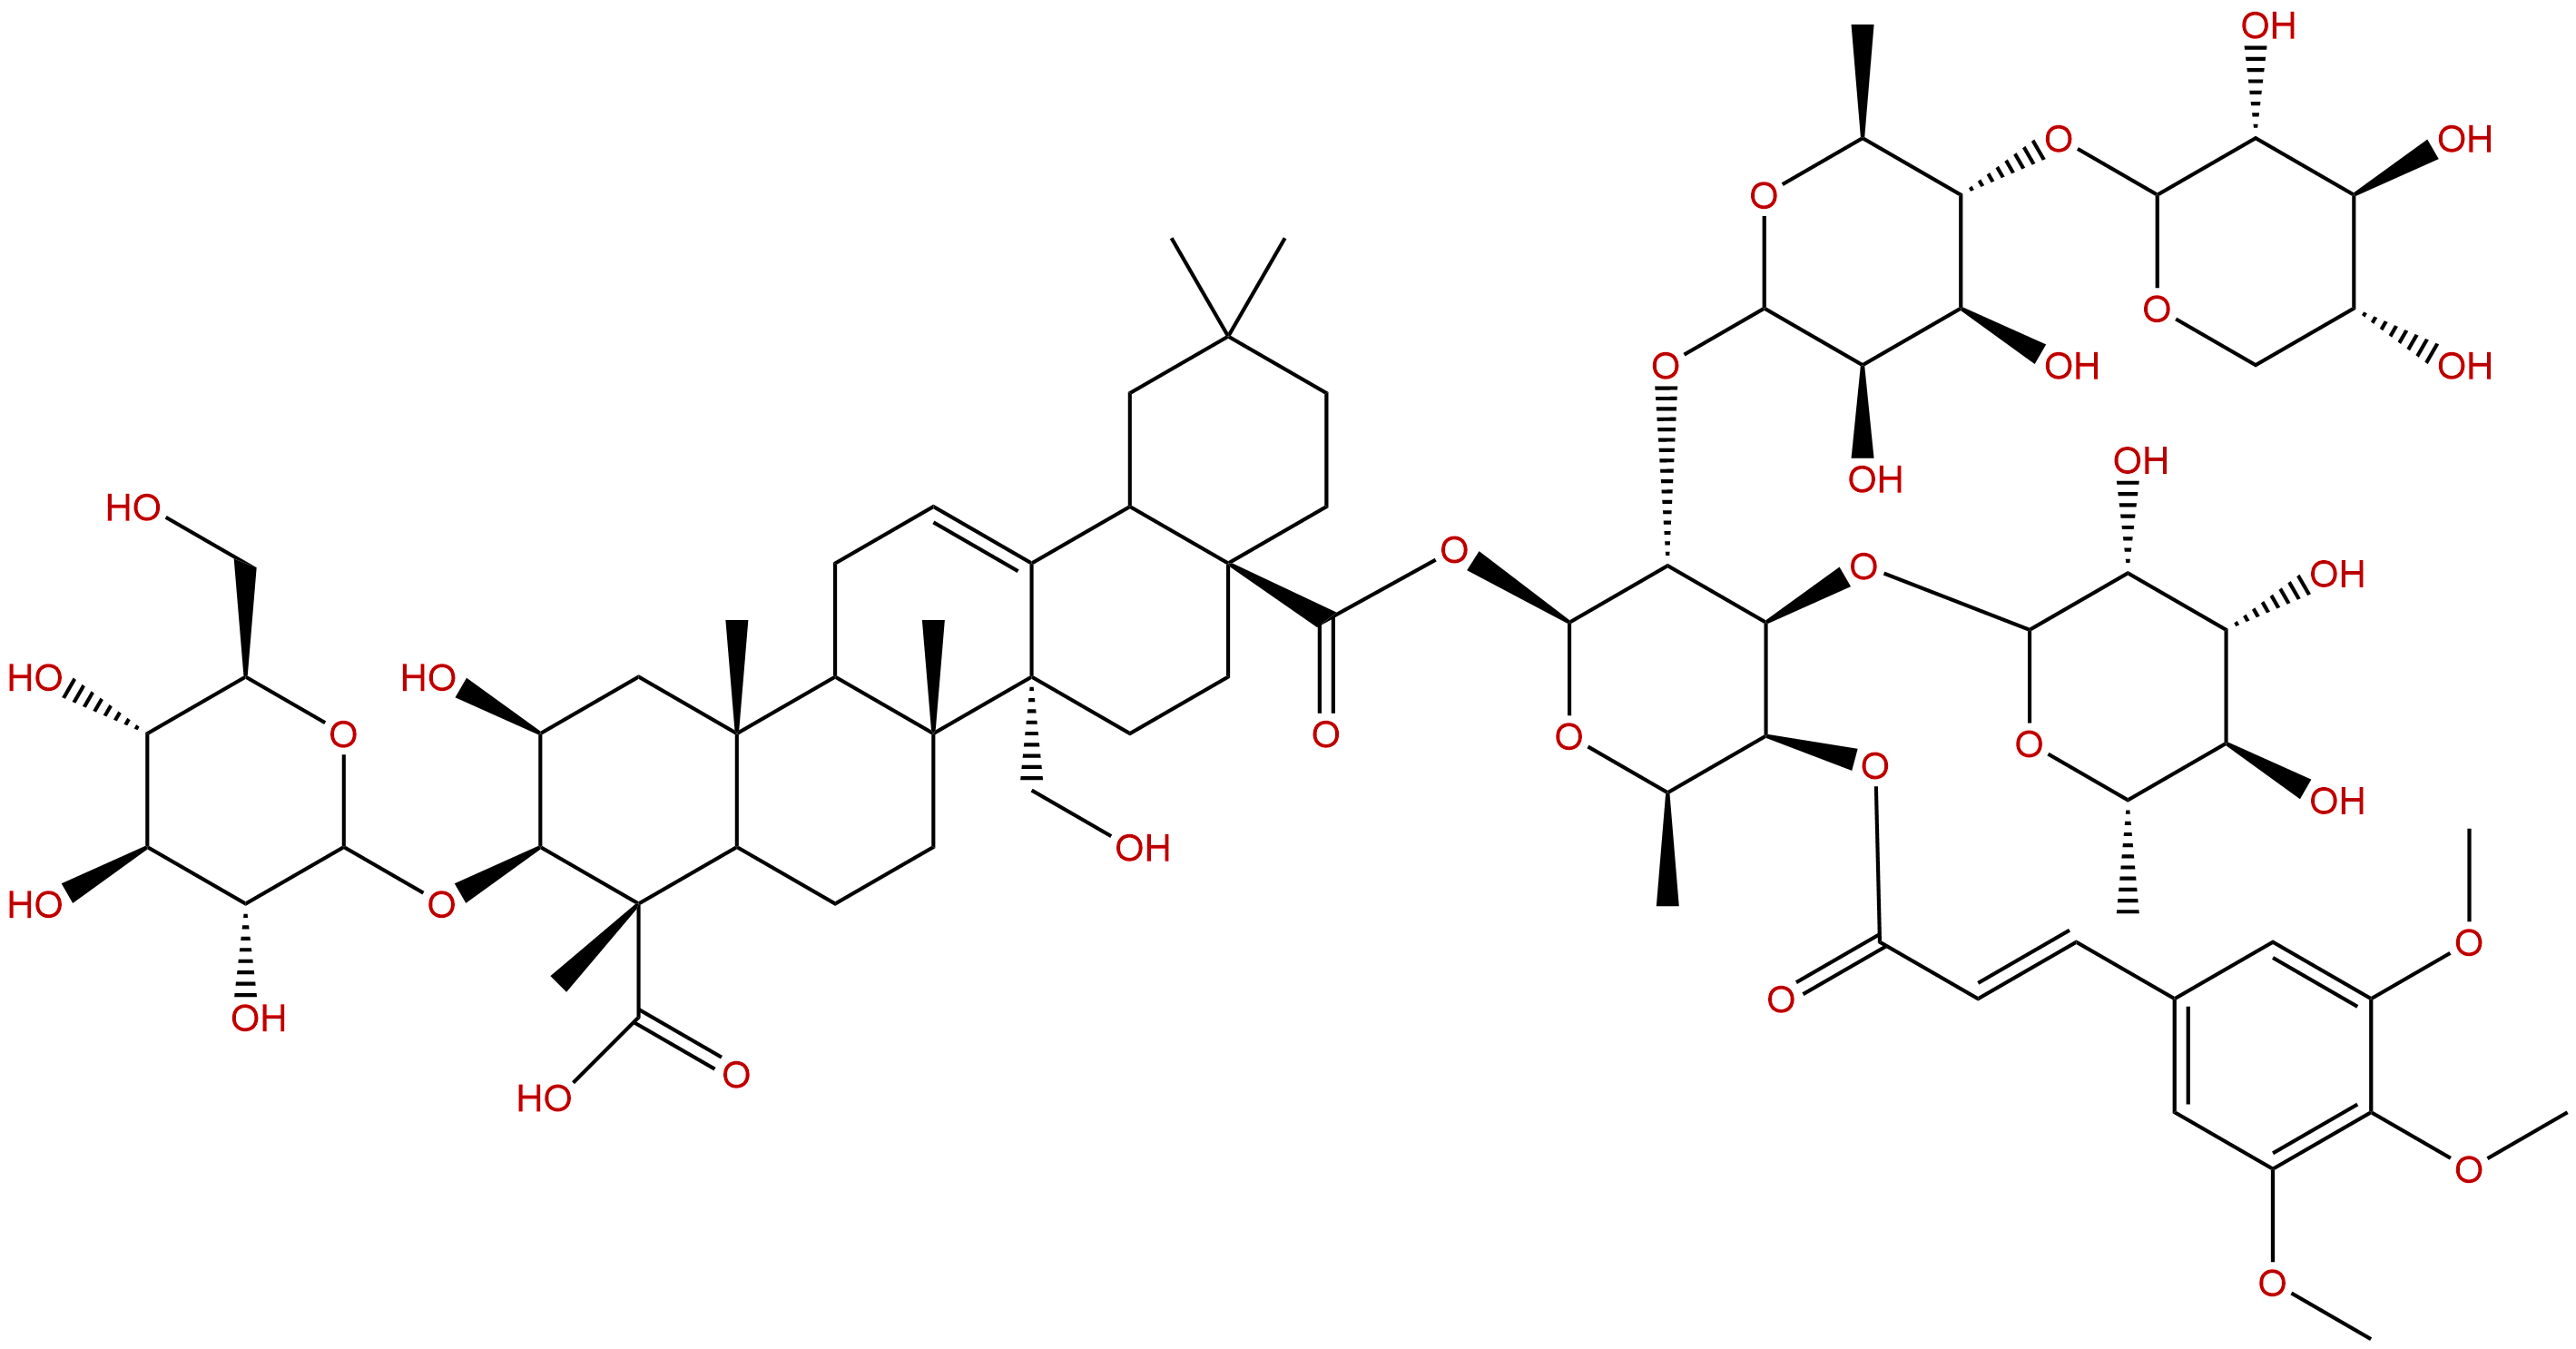 Onjisaponin Z